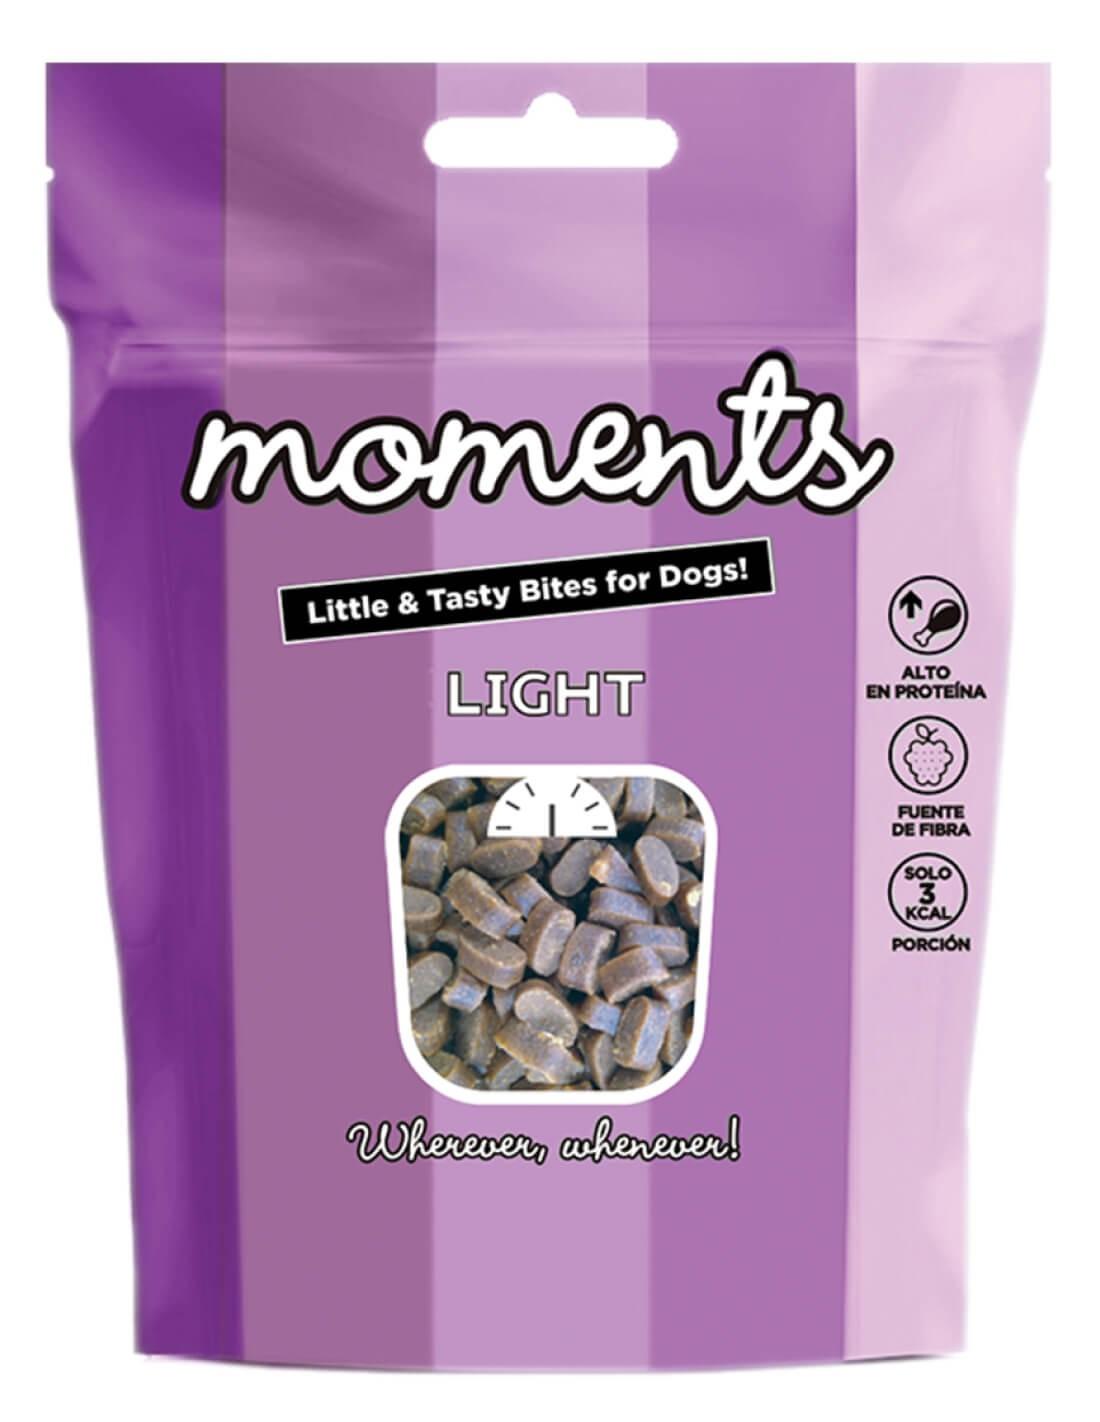 MOMENTS Light 60g - Snack para perro